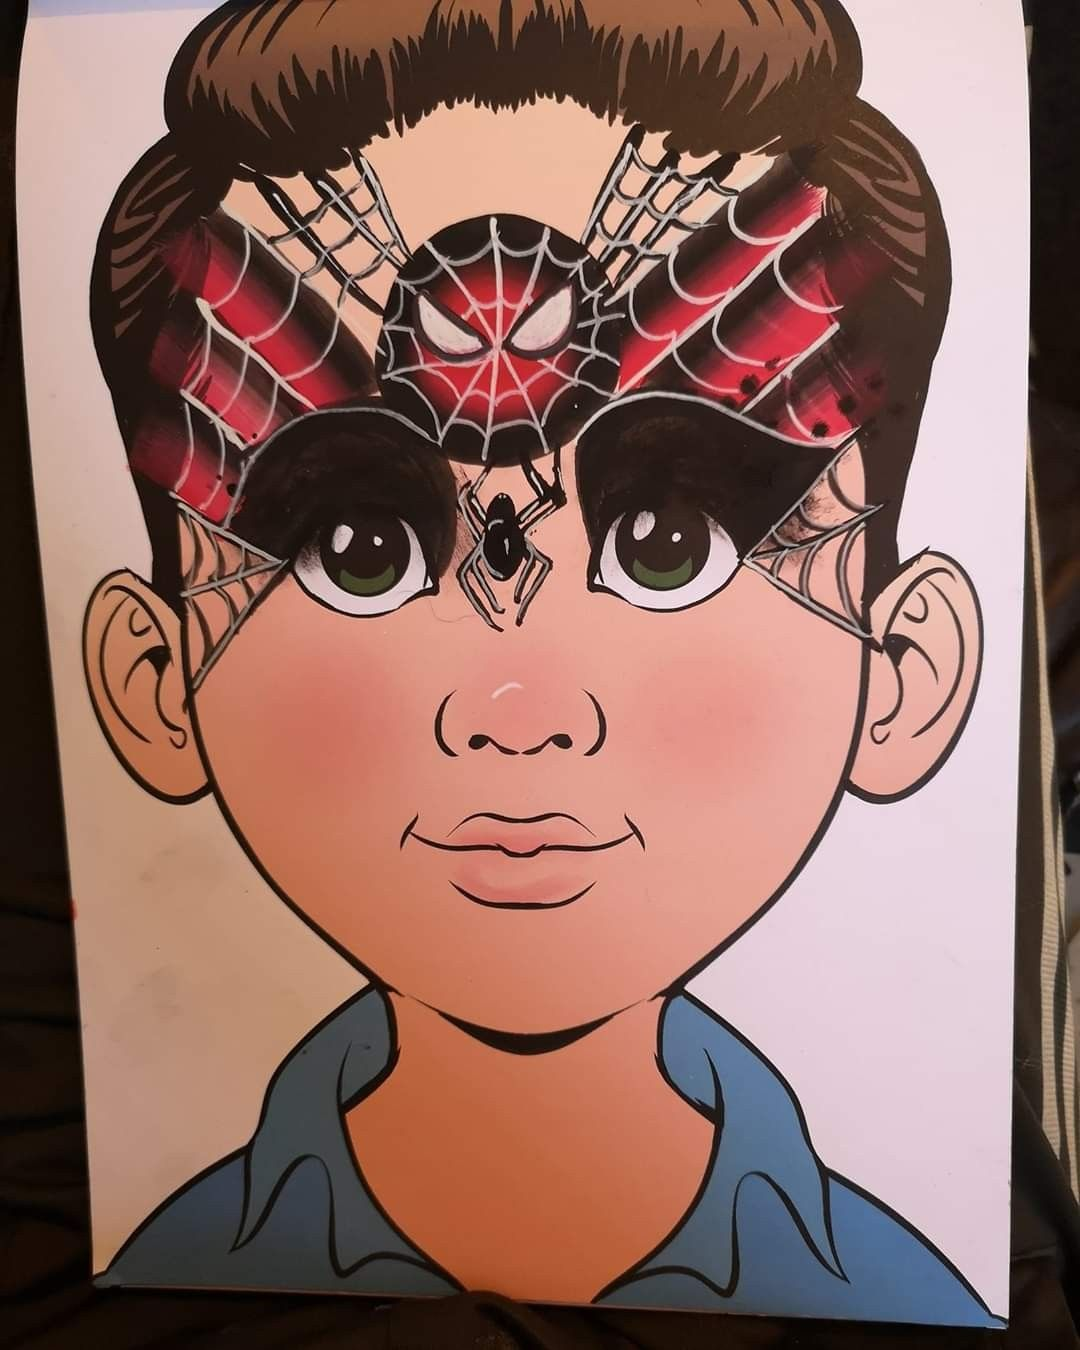 Pin By Alx Farrow On Inspiring Ideas 4 Face Painting In 2020 Spider Man Face Paint Face Painting Body Painting